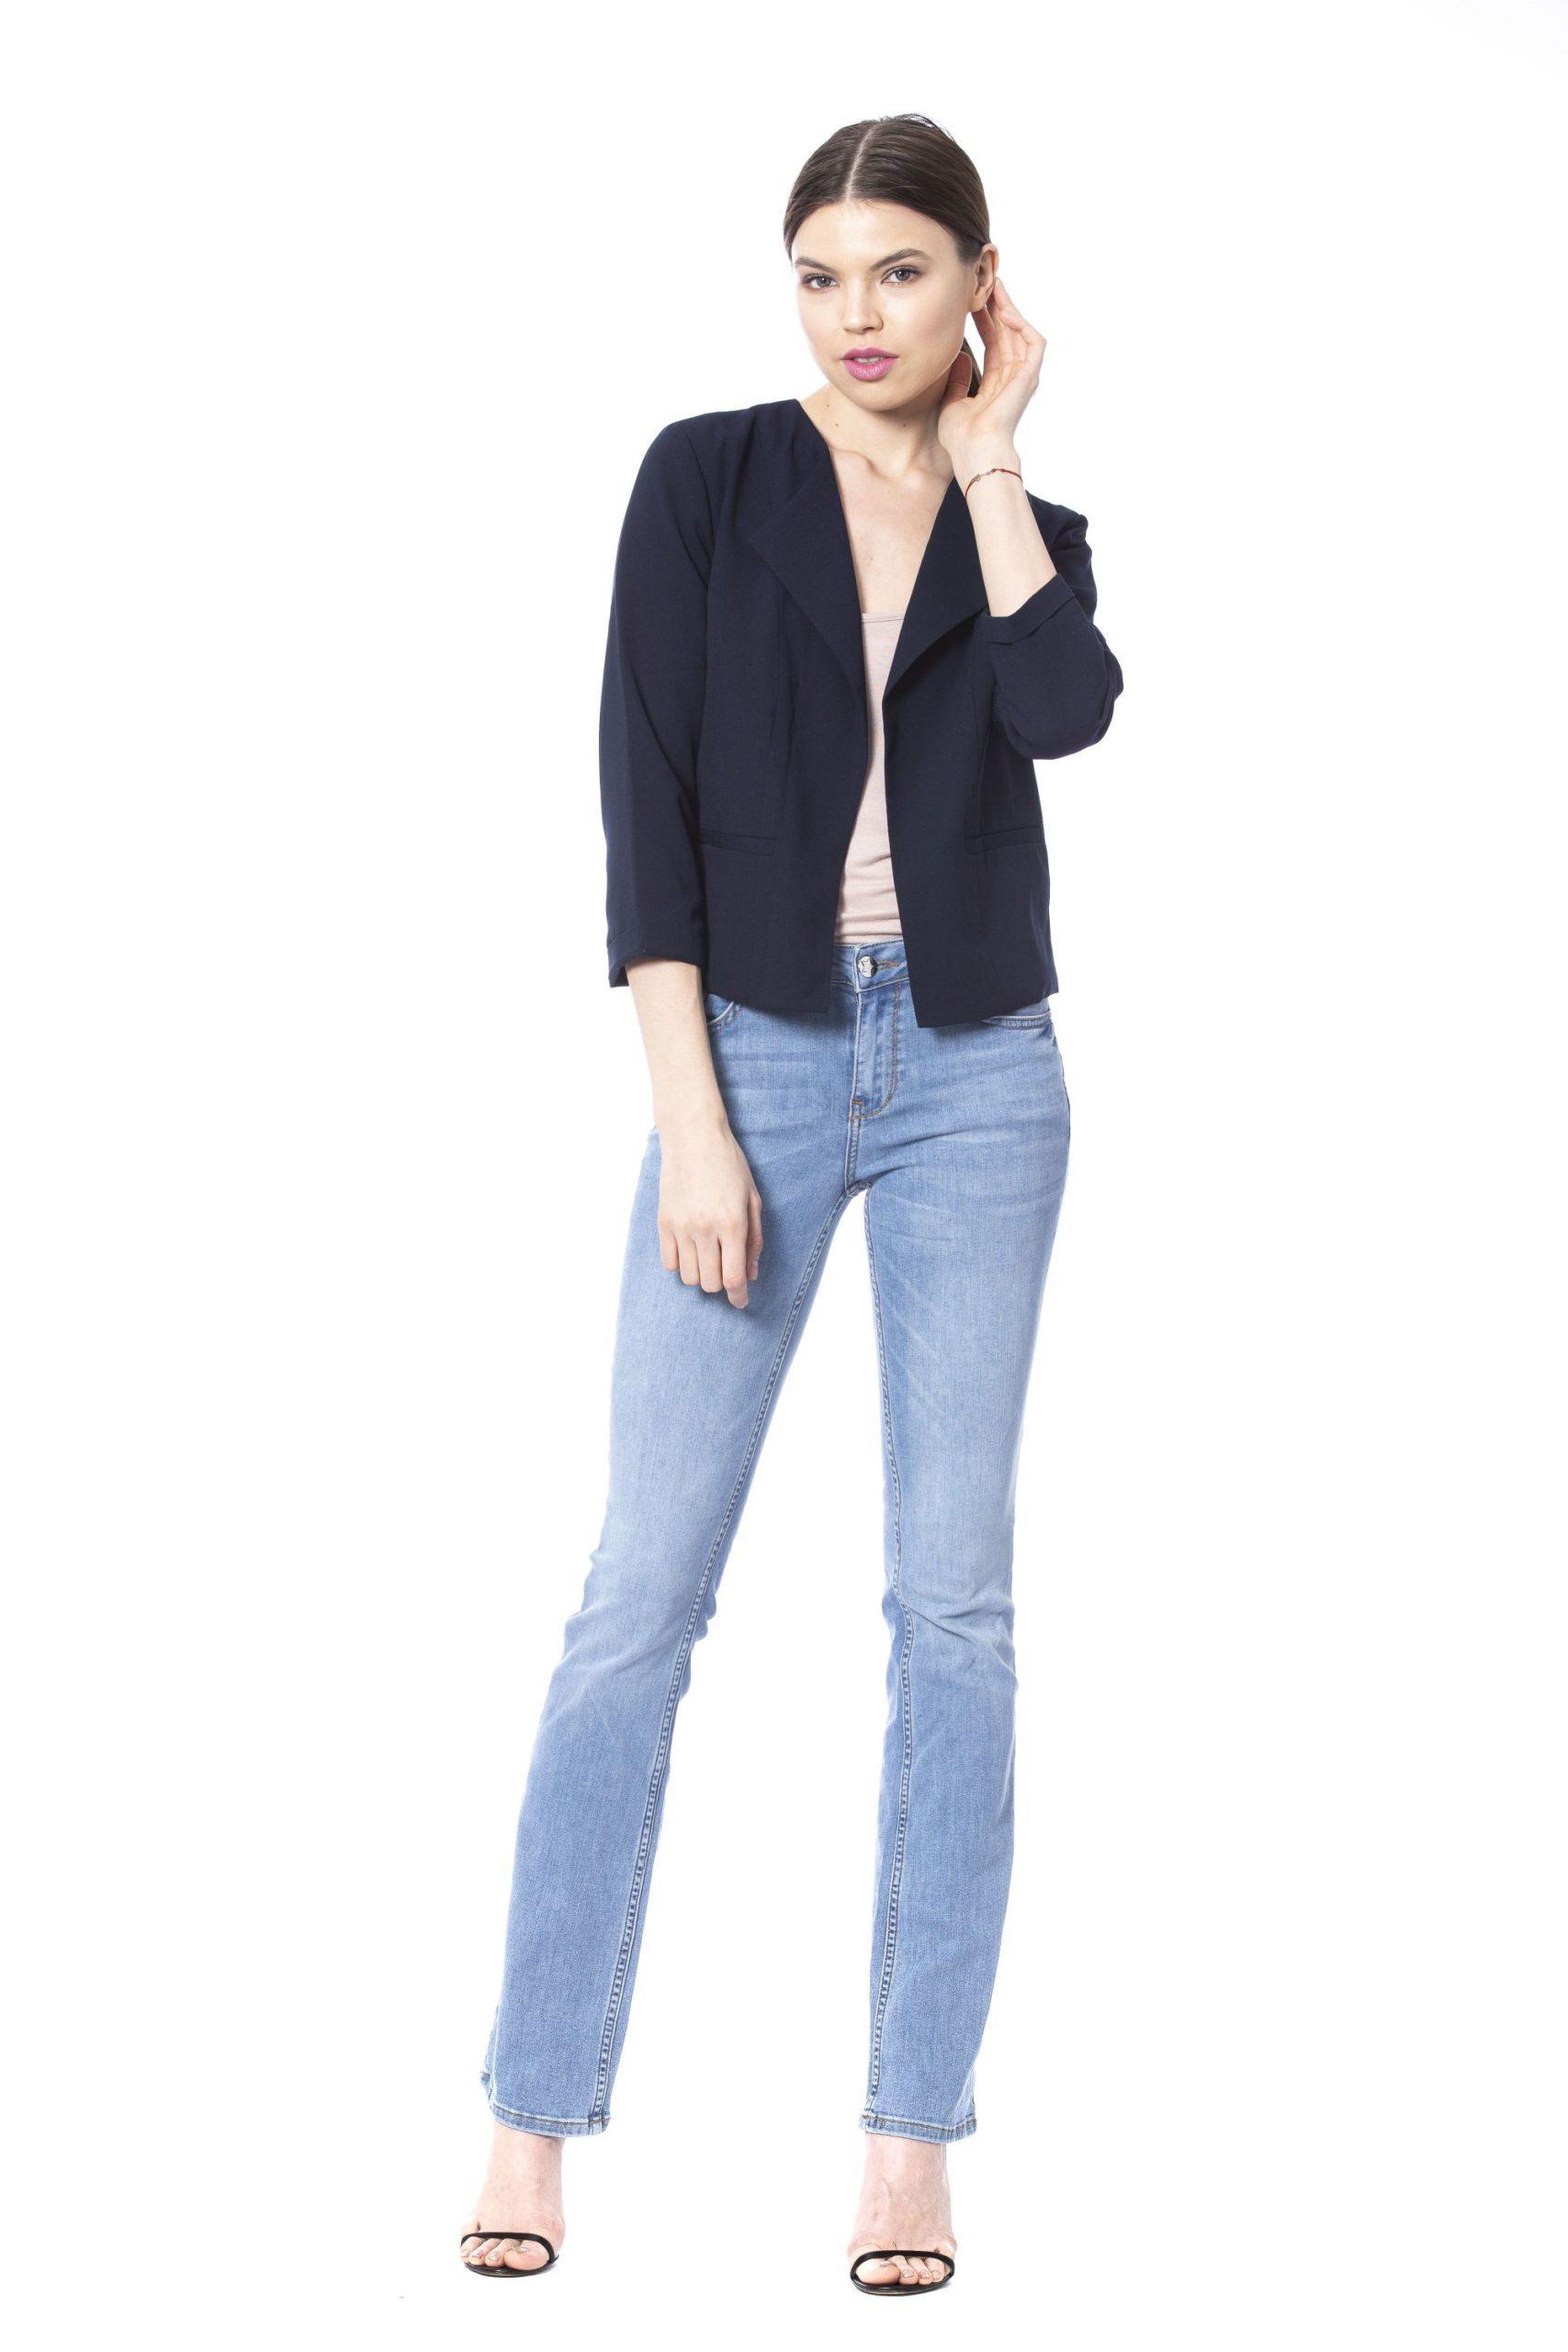 Silvian Heach Women's Formal Jacket Blue SI1264174 - XS